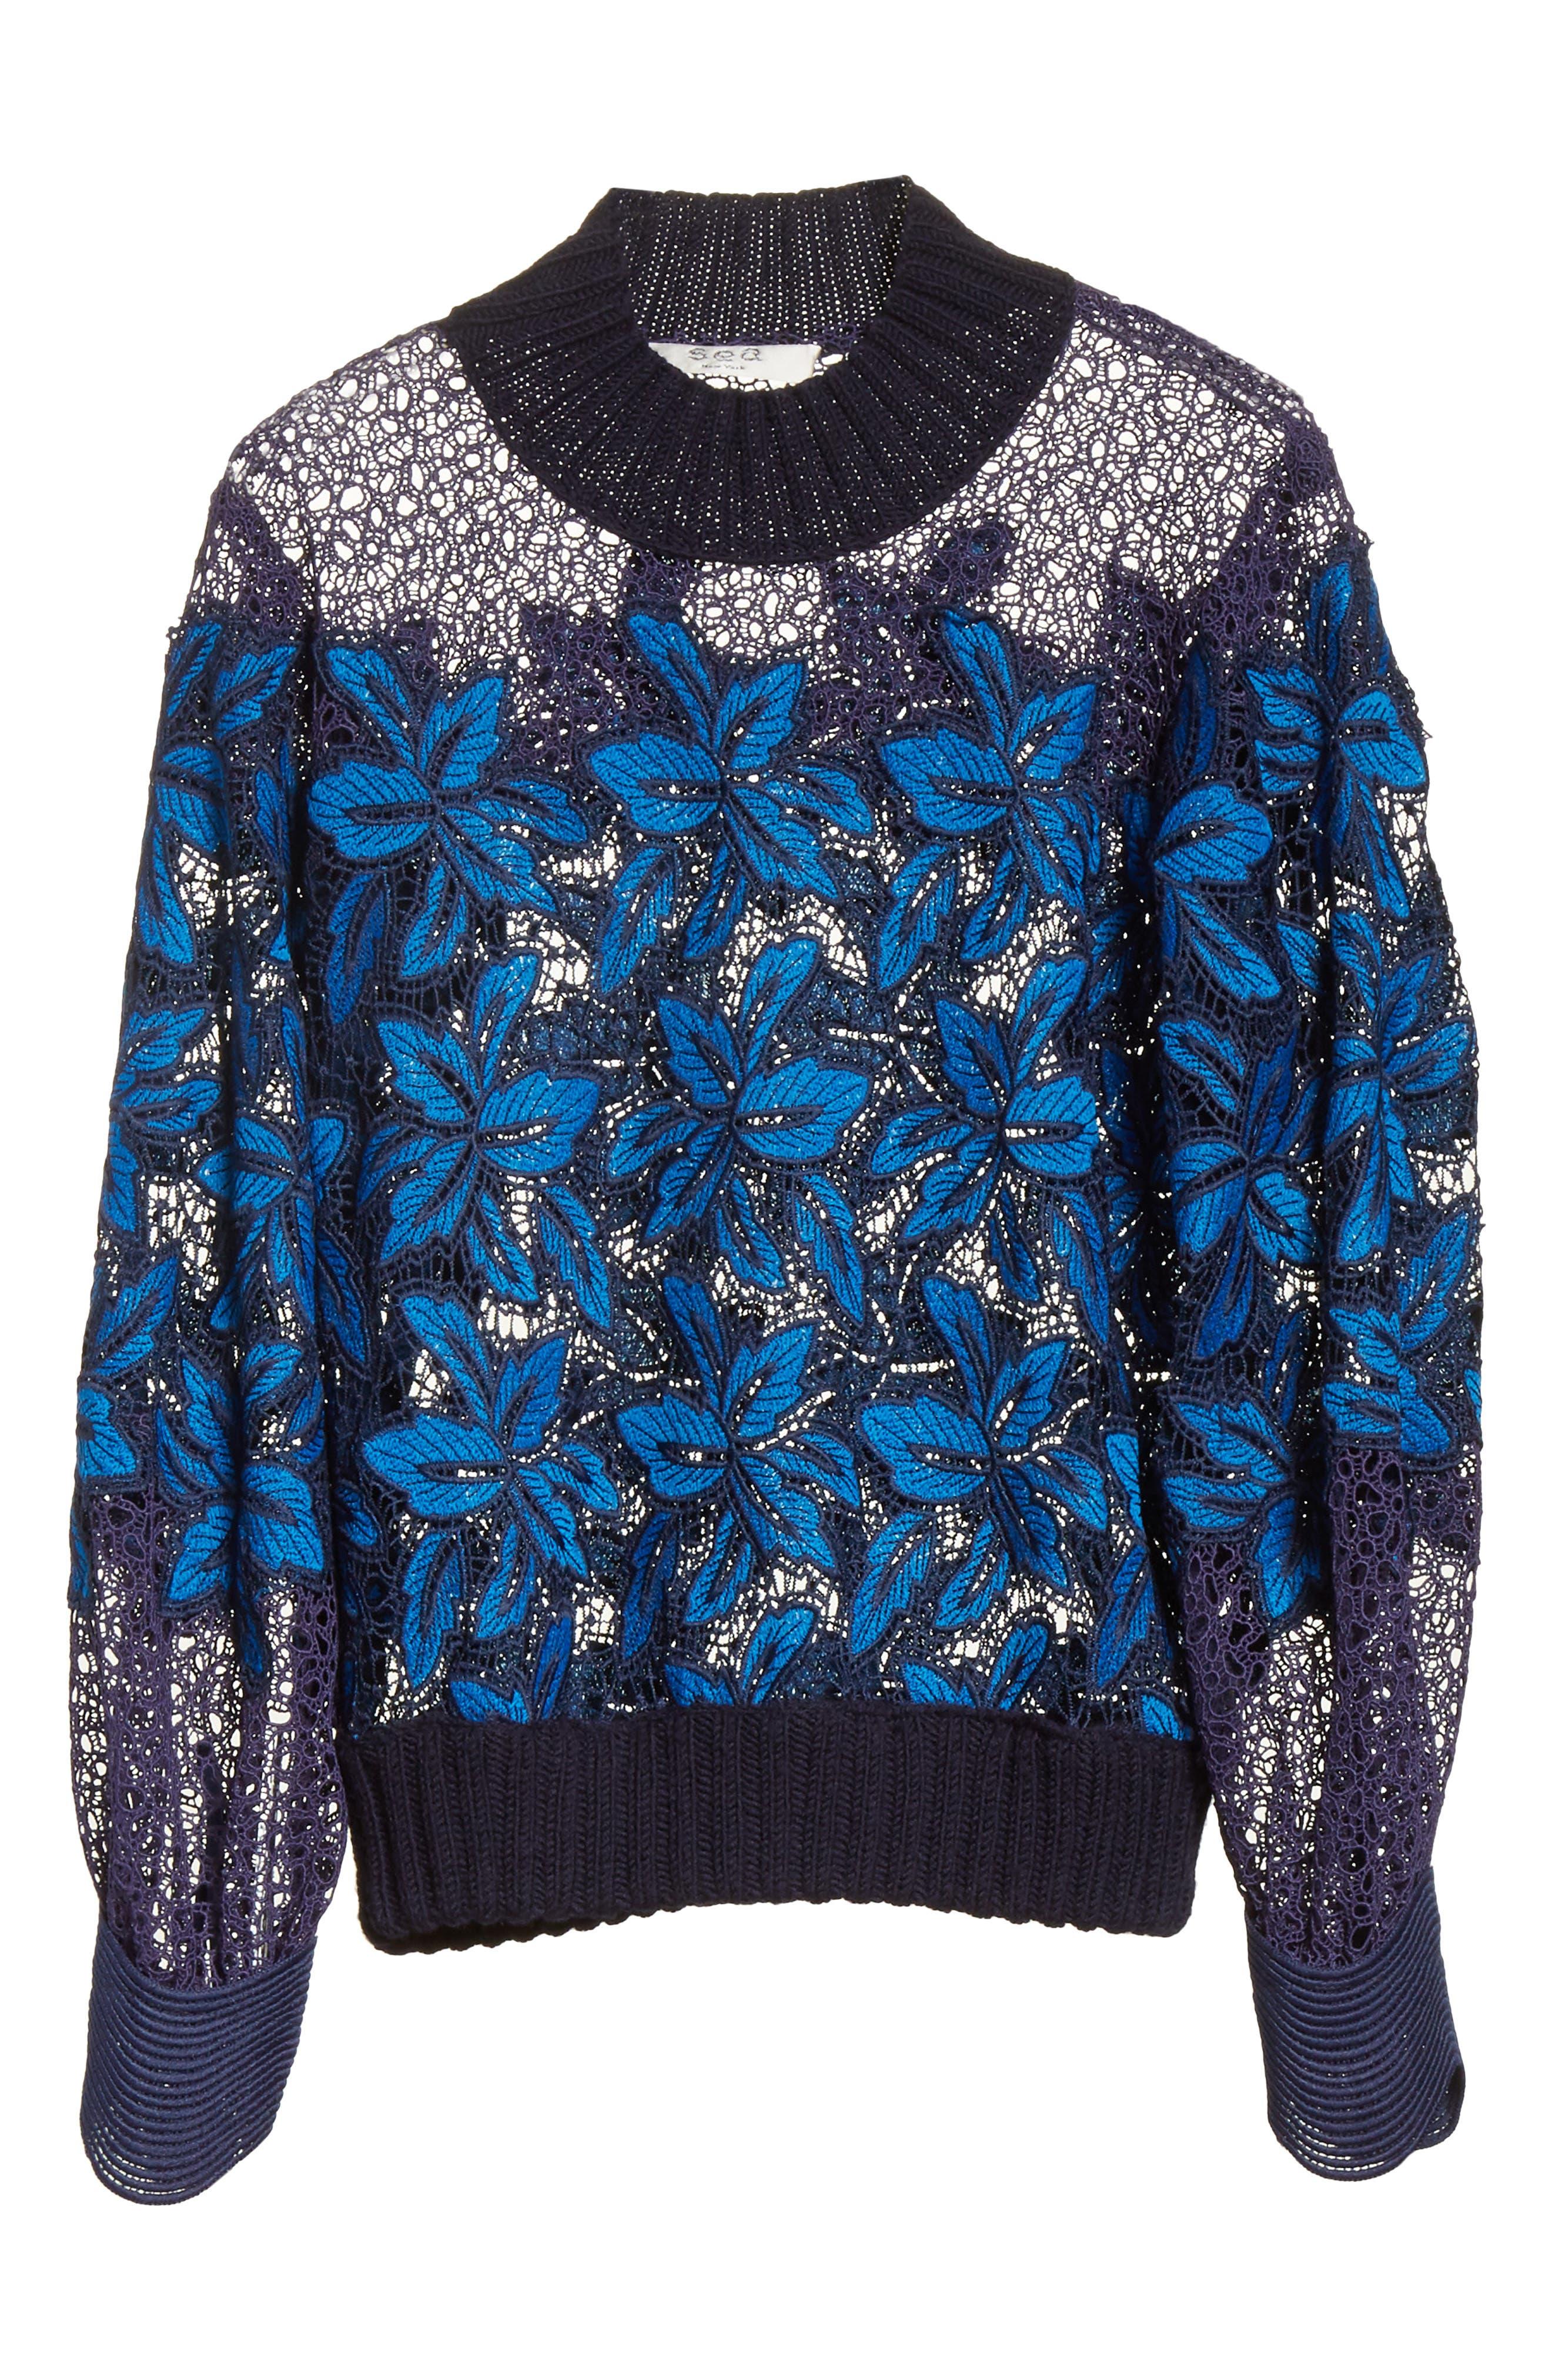 Mosaic Lace Bell Sleeve Sweatshirt,                             Alternate thumbnail 6, color,                             Blue Multi